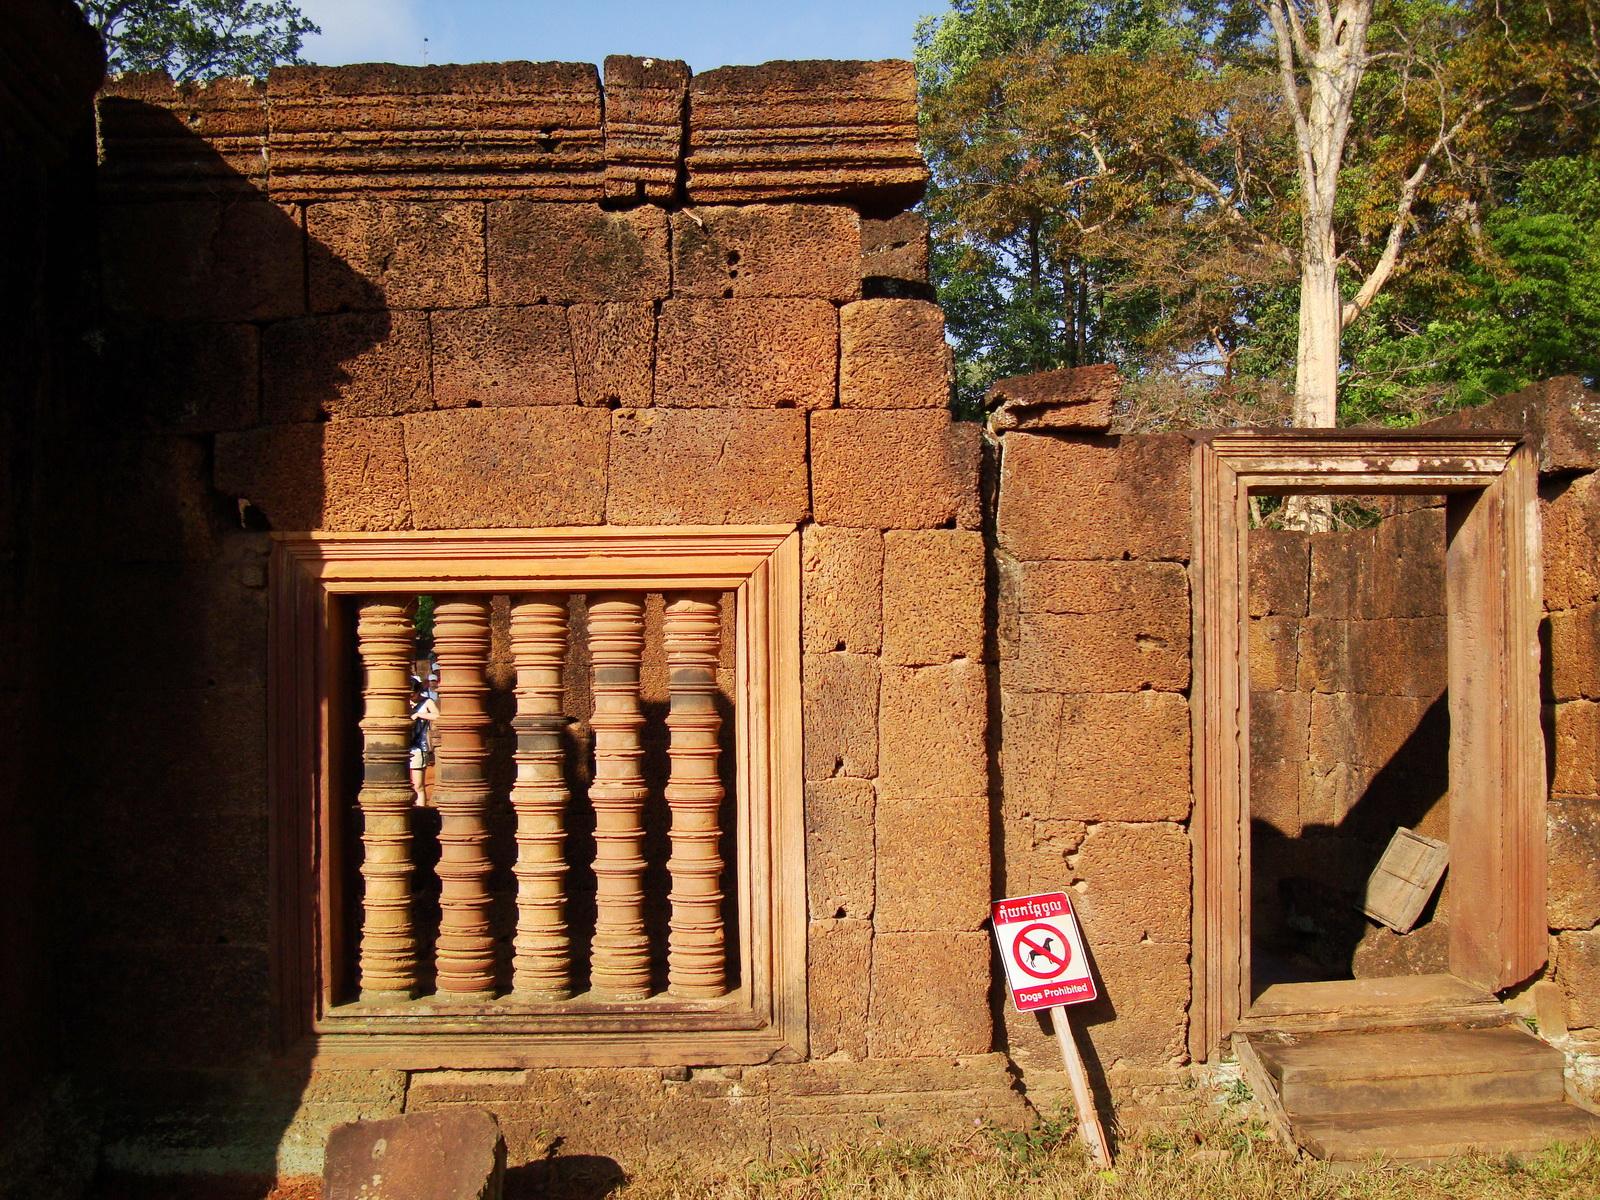 Banteay Srei Temple 10th century architecture laterite walls 03